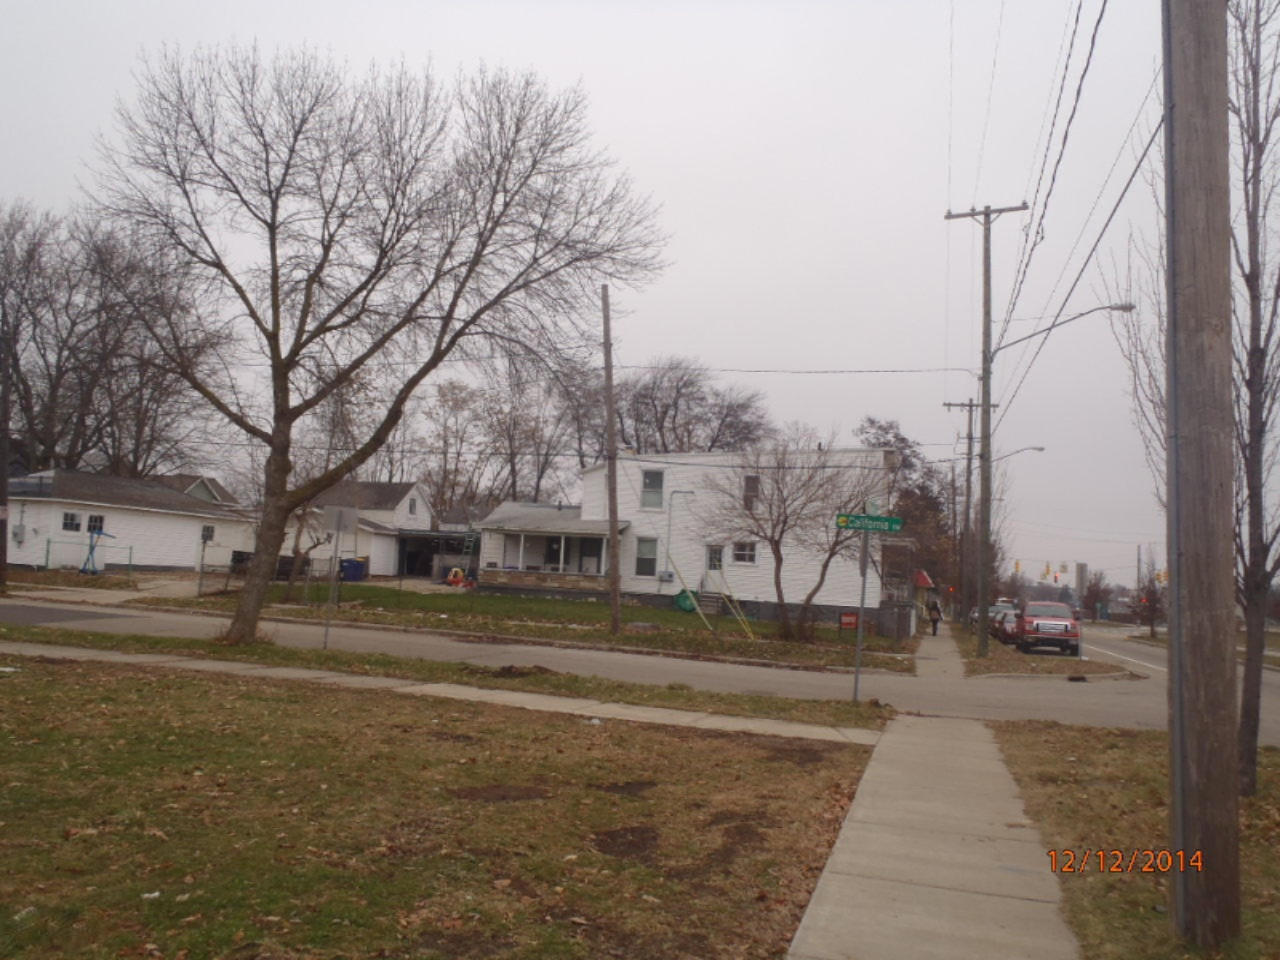 103 Seward Avenue Nw, Grand Rapids MI 49504